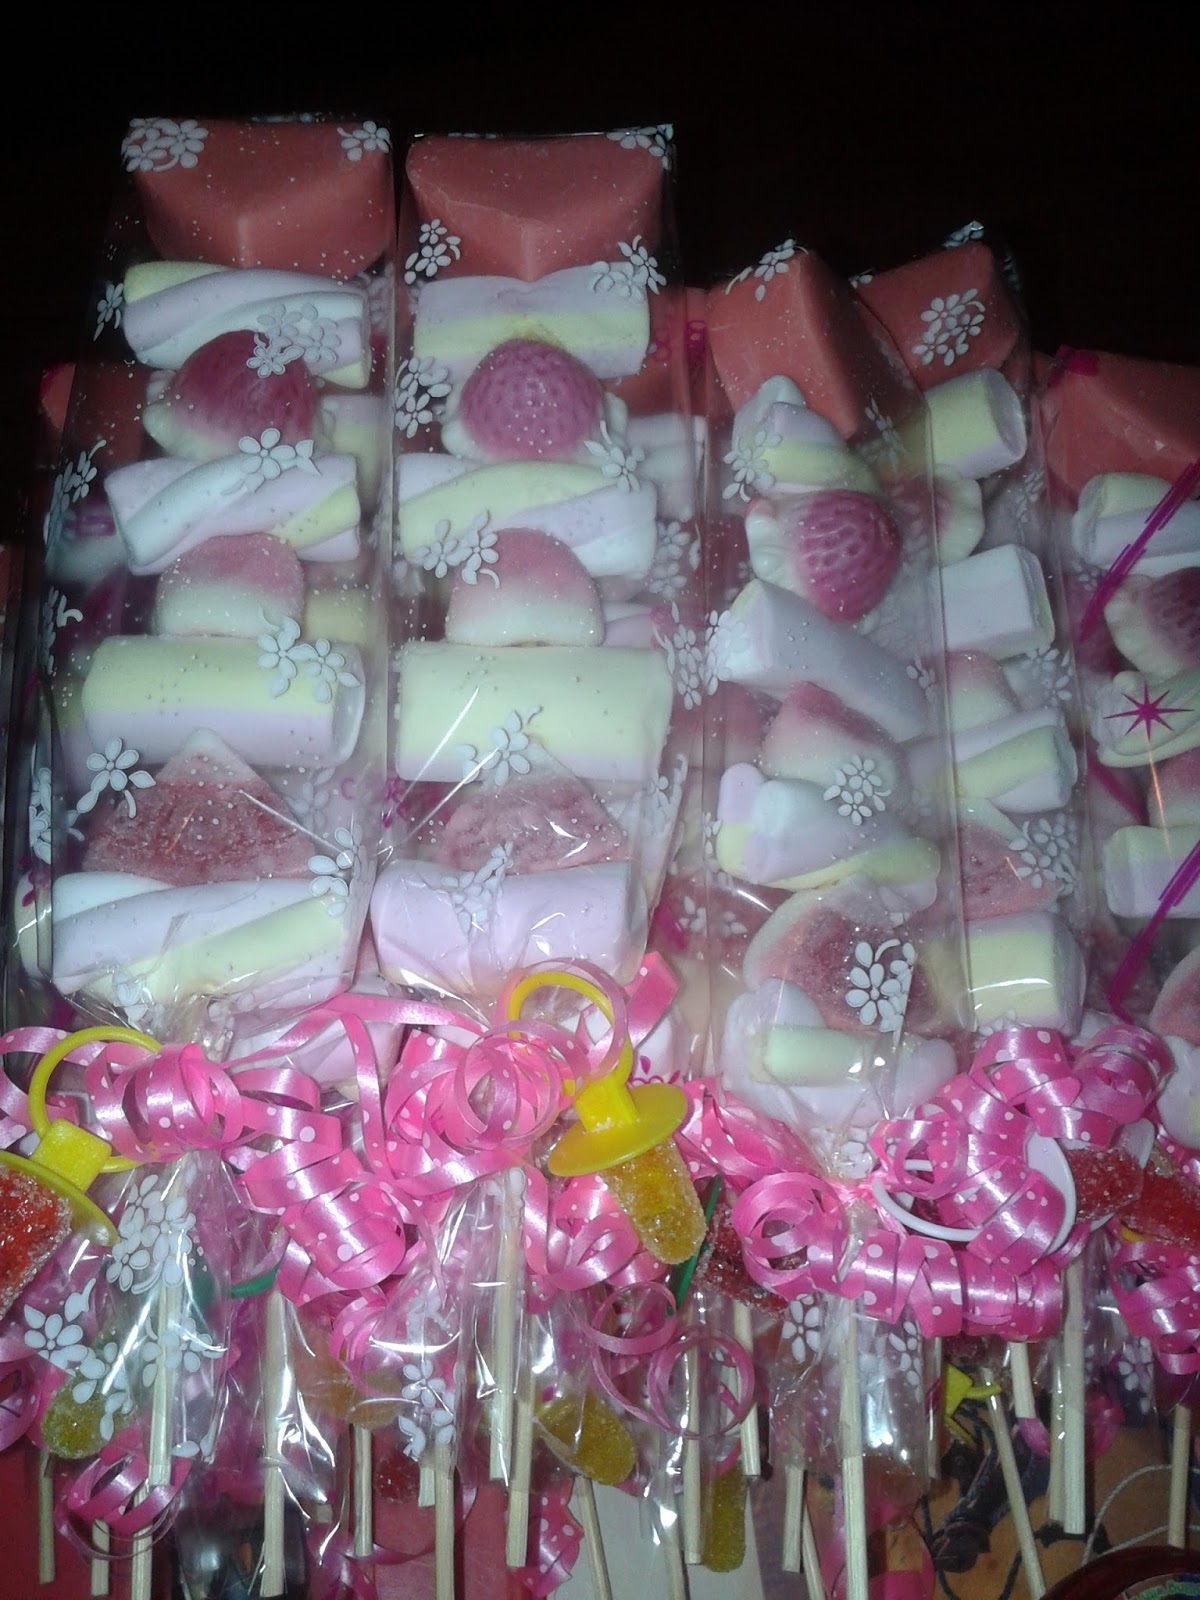 El regalo m s dulce tartas chuches y mucho m s - Chuches para bautizo ...